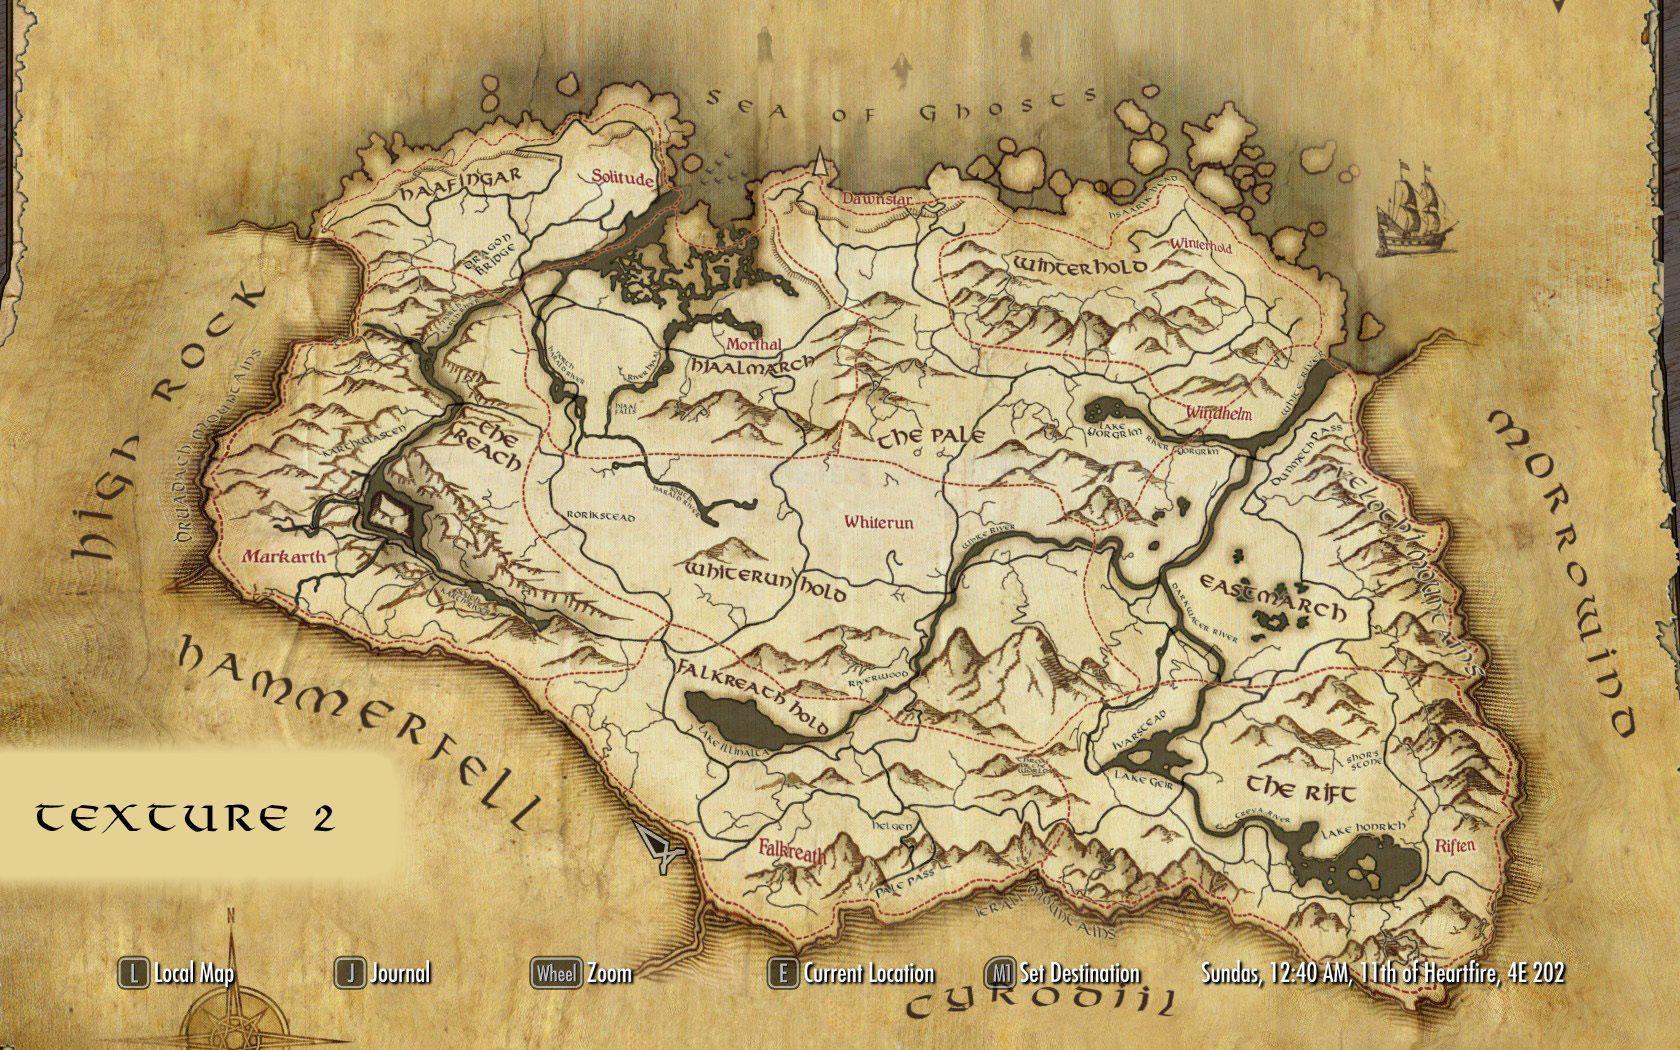 Dark Souls Map Wallpapers - Top Free Dark Souls Map ... on red dead redemption world map, super mario 3d land world map, advance wars world map, rayman legends world map, goat simulator world map, infamous second son world map, super mario bros. 3 world map, lords of the fallen world map, borderlands world map, rage world map, minecraft world map, demon's souls map, charlie murder world map, elder scrolls world map, kingdoms of amalur world map, the sims 4 world map, sacred 3 world map, two worlds world map, grim dawn world map, battlefield 4 world map,